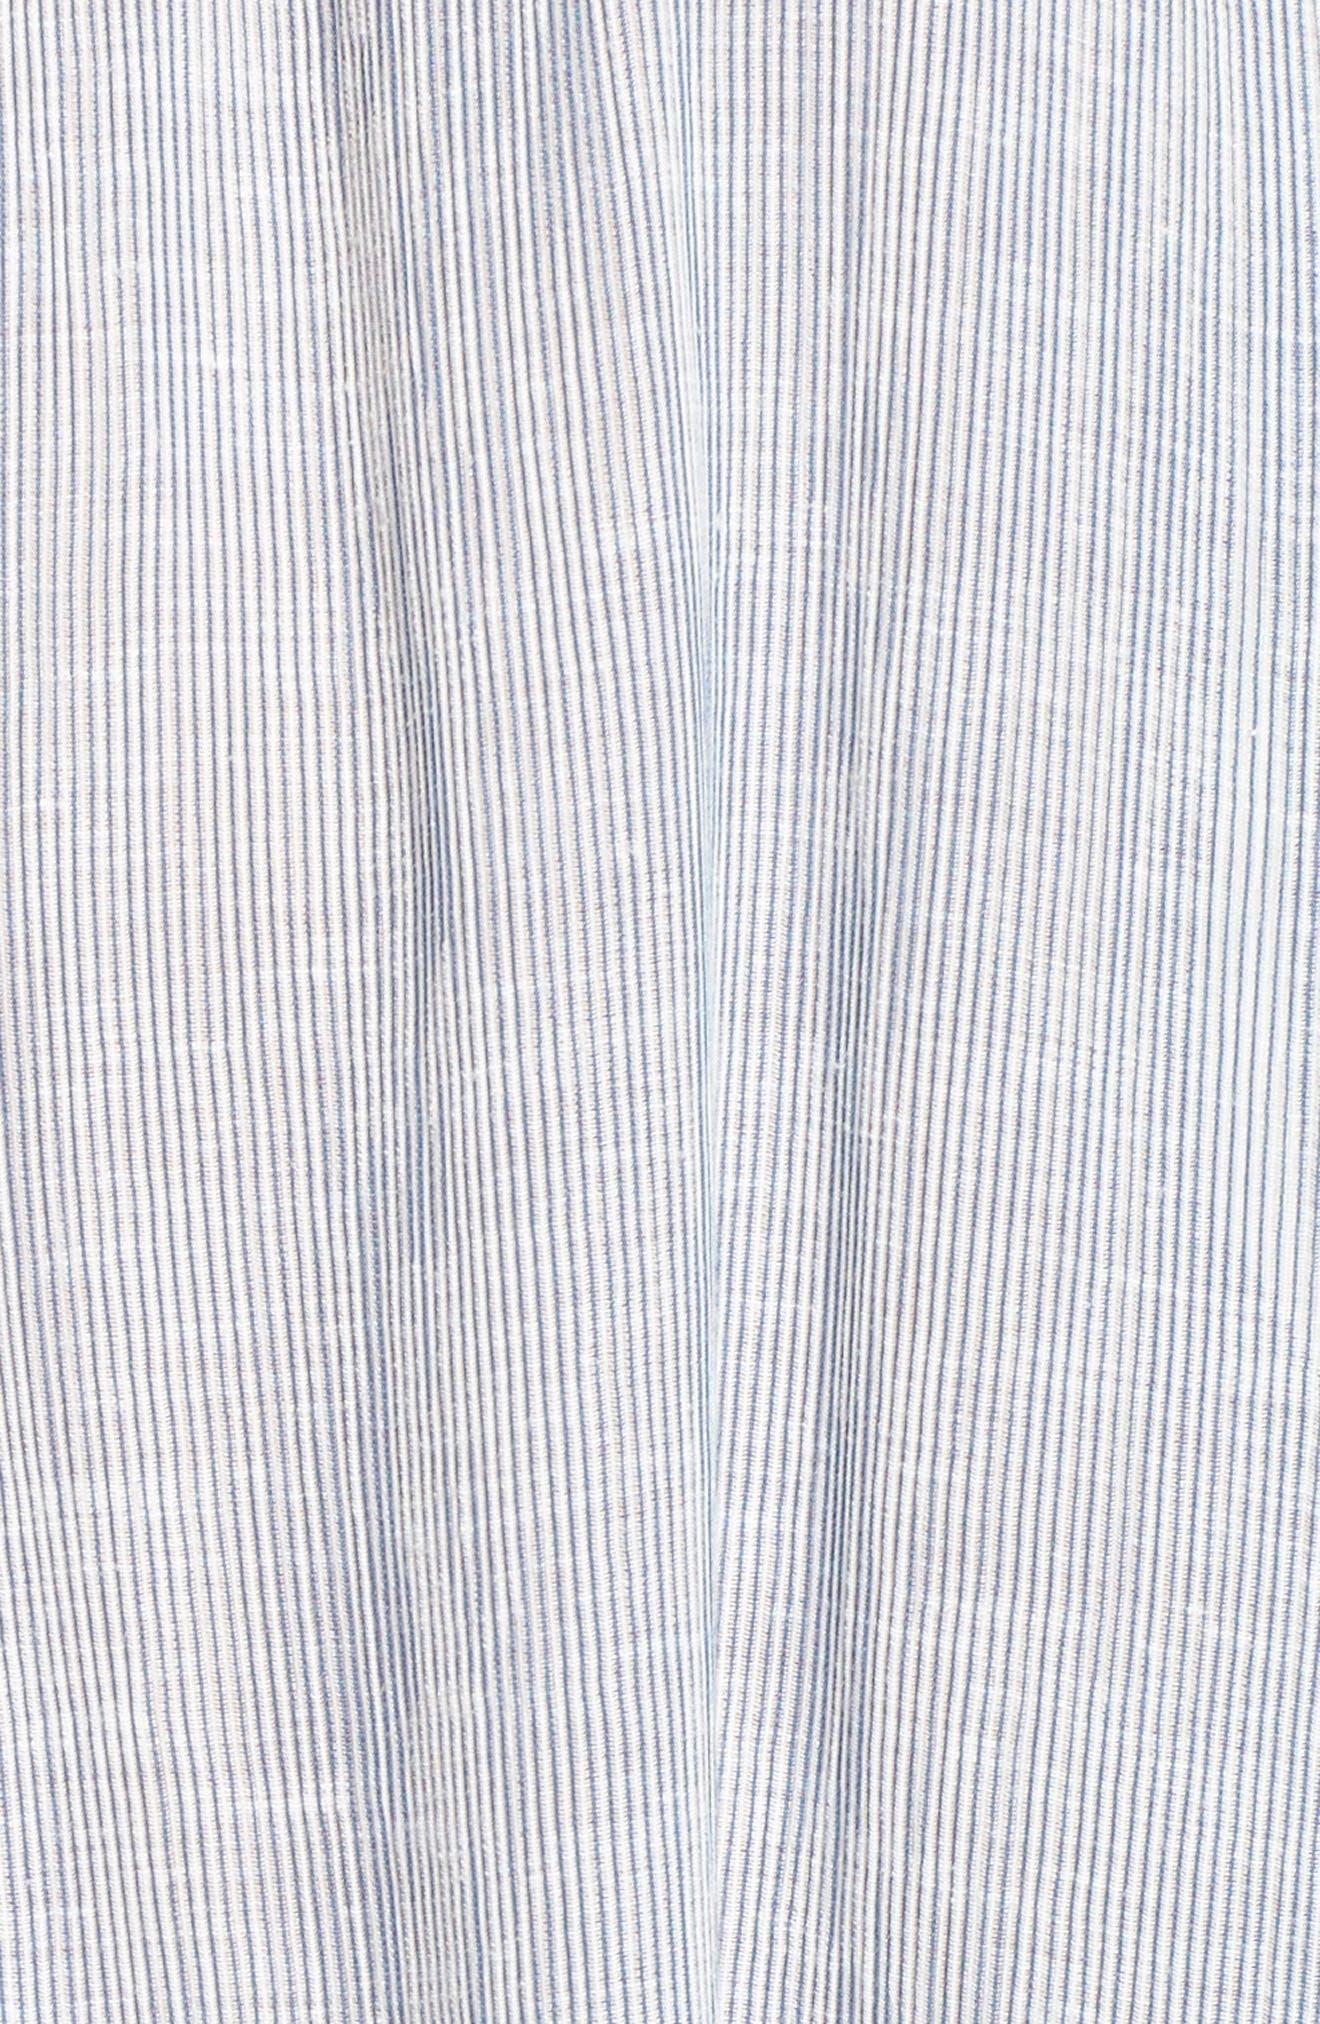 Tallulah Off the Shoulder Blouse,                             Alternate thumbnail 5, color,                             Navy/ White